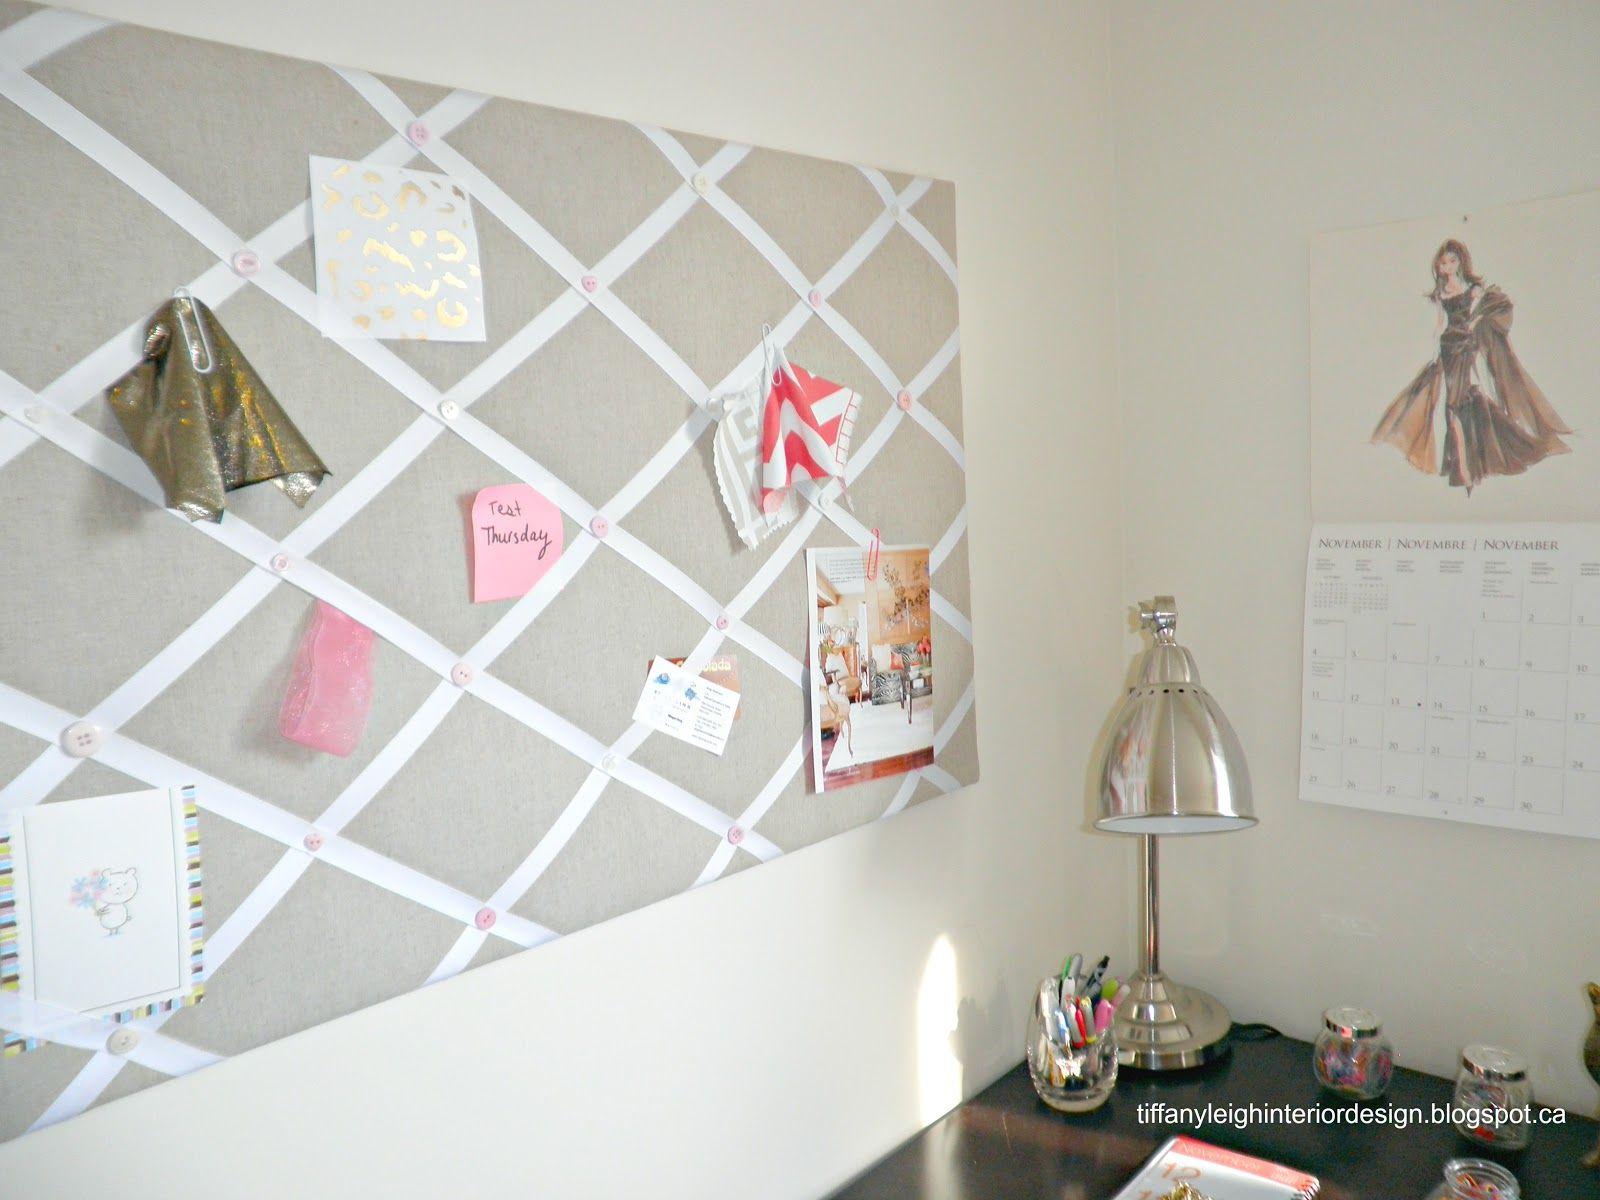 Tiffany Leigh Interior Design: DIY Ribbon and Linen Pinboard | If I ...